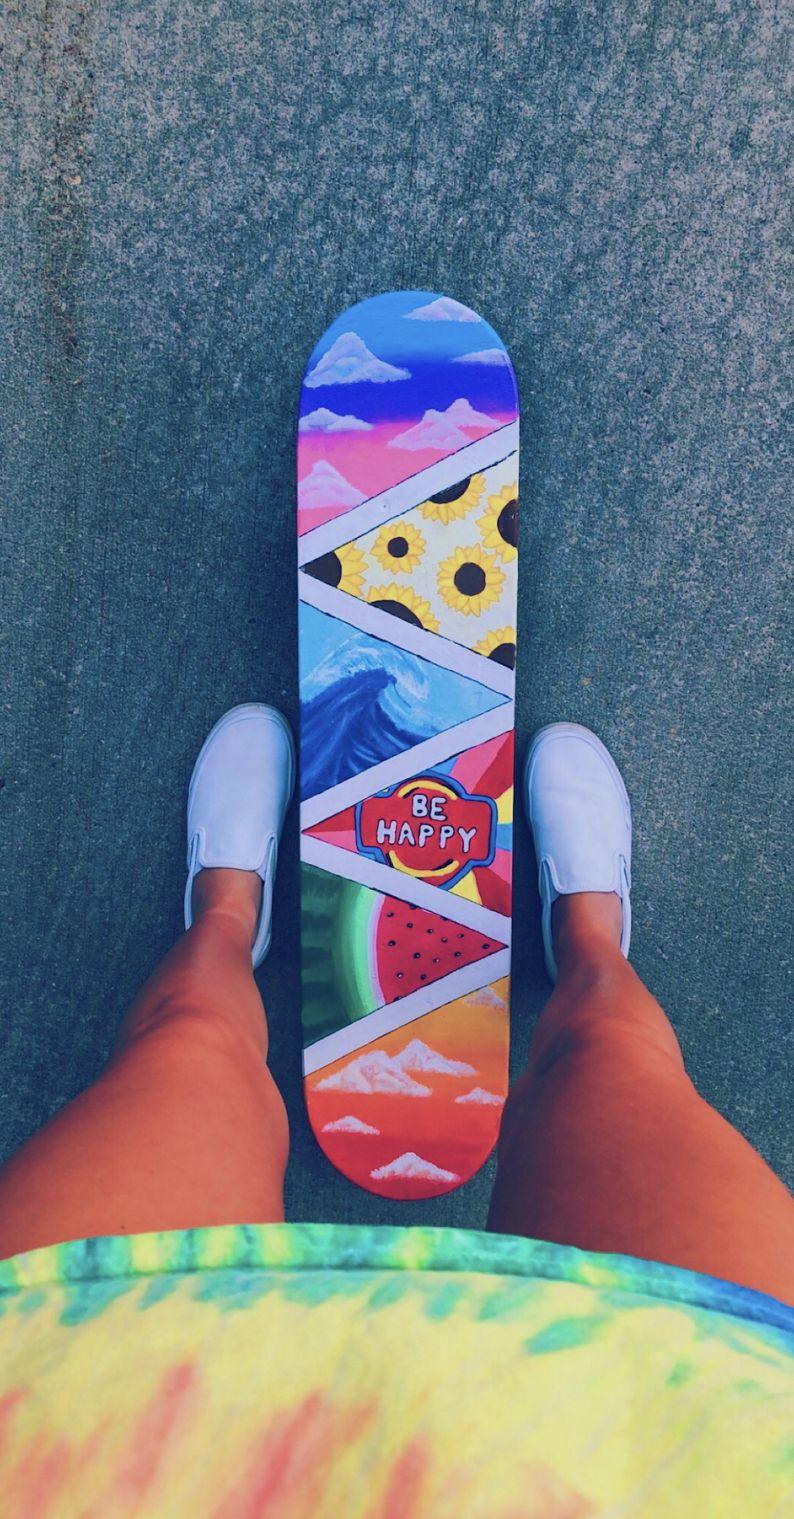 Happy Vibe Skateboard Pinterest Caitmcelwee Vsco Pictures